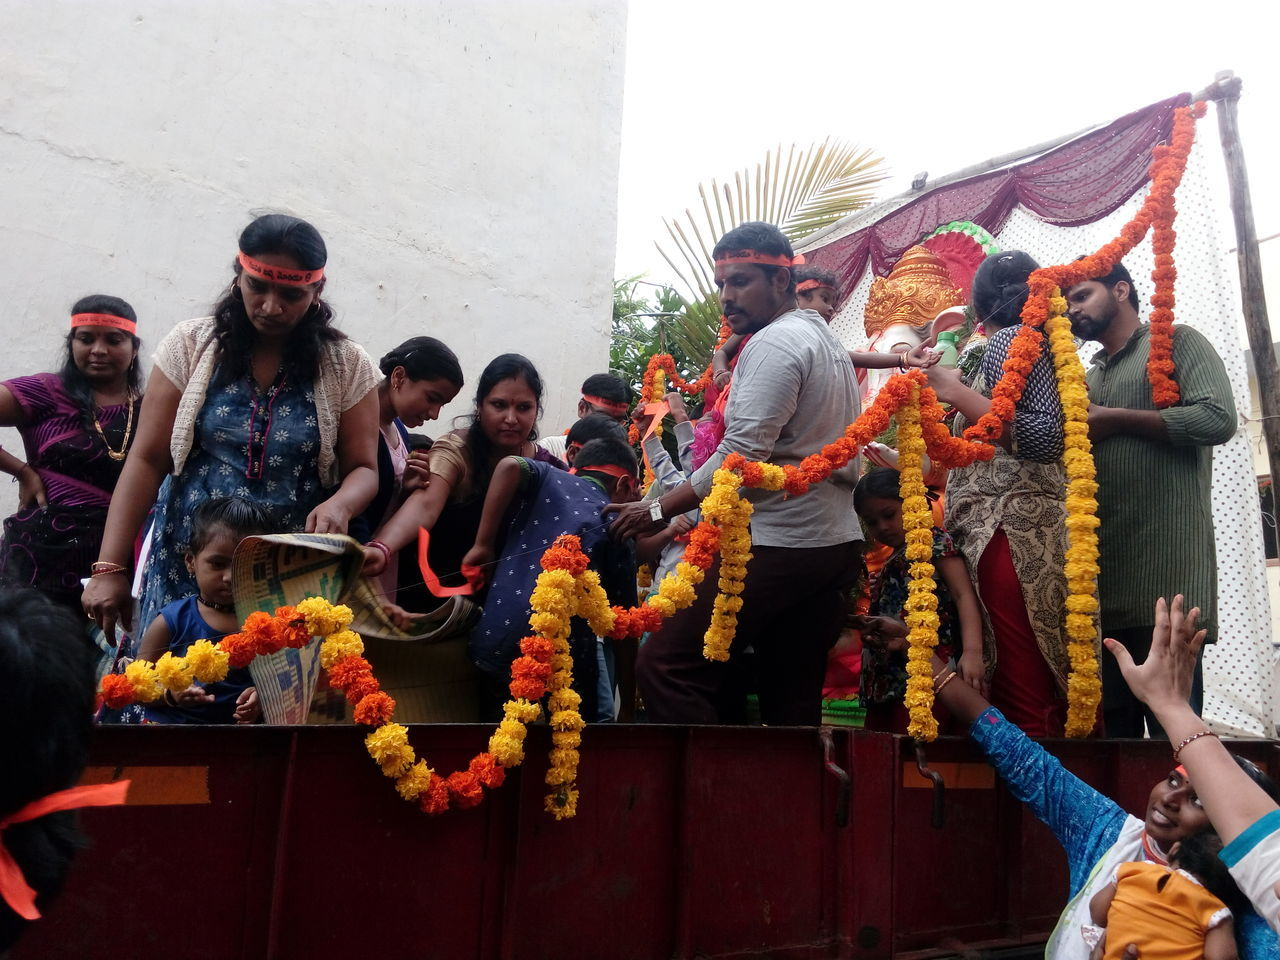 No Edit/no Filter Celebration Ganesha Visarjan Ganesha Statue Visarjanday Ganesha Lord Of Success Ganeshafestival Celebrated Outdoors